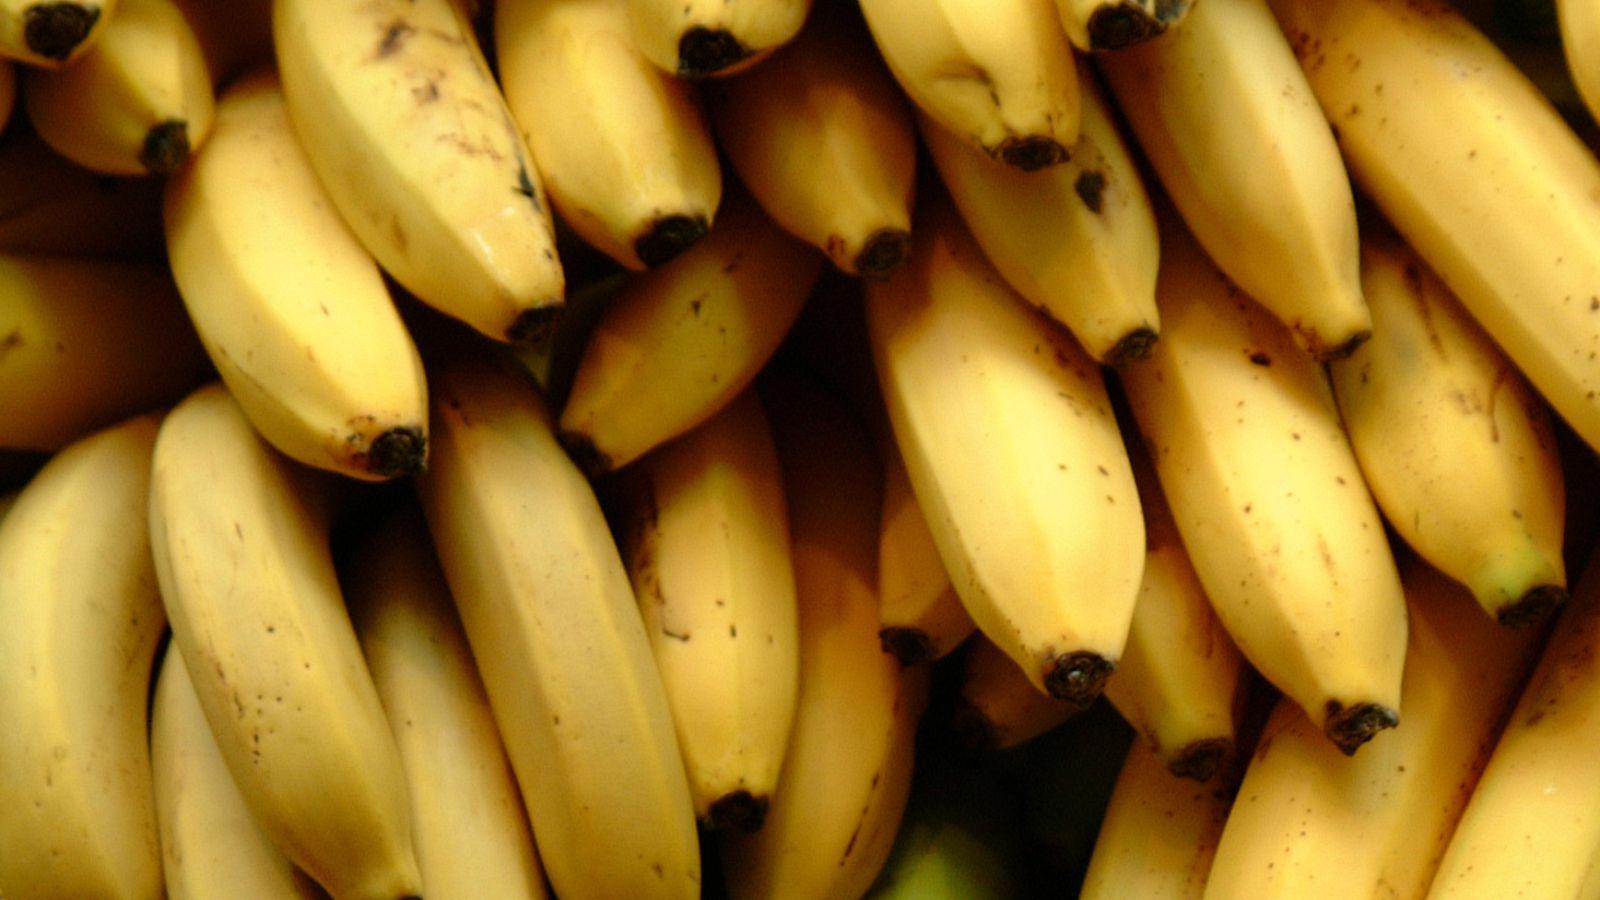 ian-ransley-flickr-bananas-crop